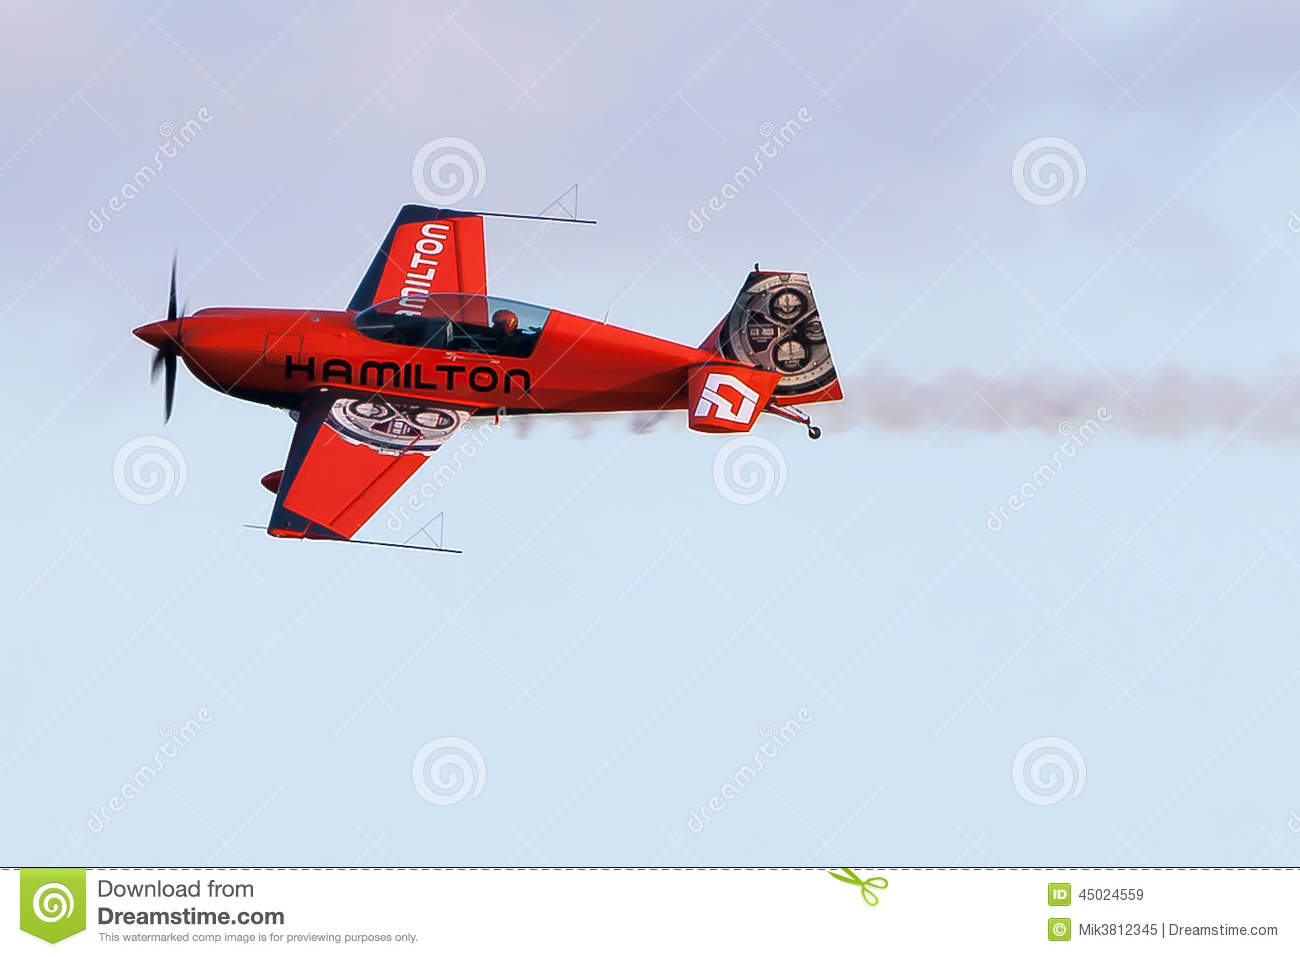 nicolas-ivanoff-hamilton-aircraft-edge-festa-al-cel-sky-party-air-show-september-45024559.jpg